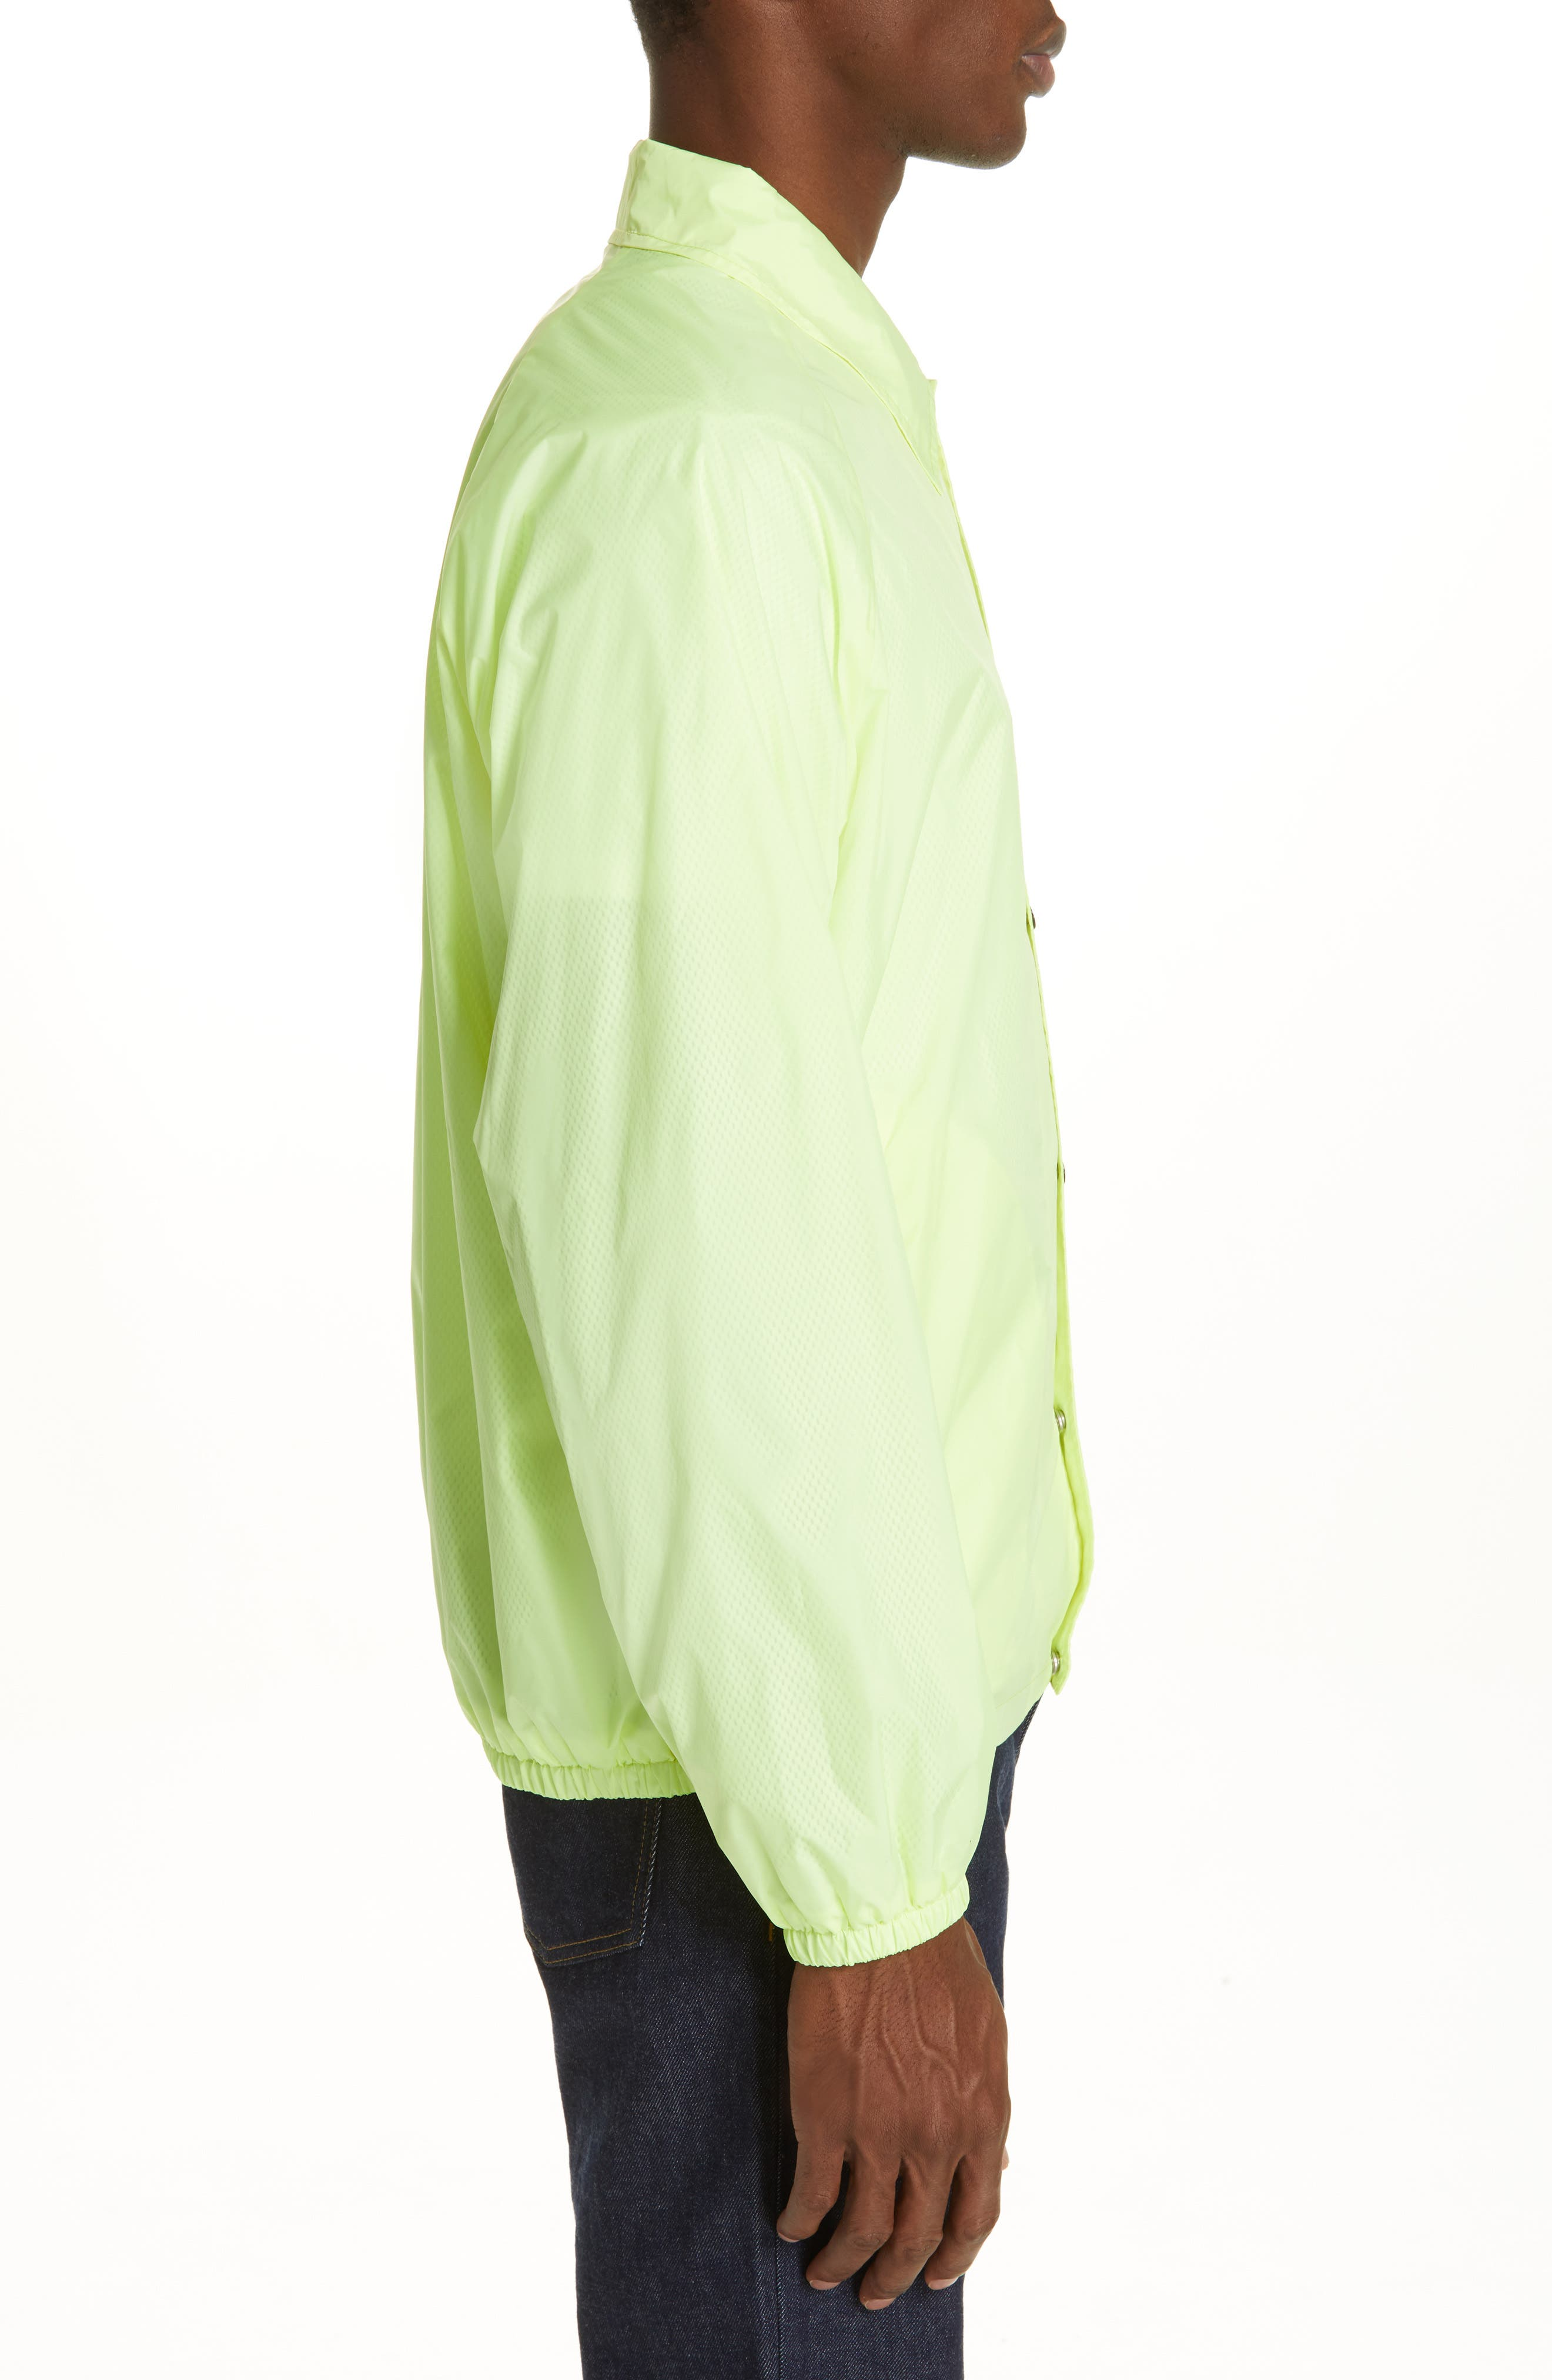 MAISON MARGIELA, Stereotype Coach's Jacket, Alternate thumbnail 3, color, NEON YELLOW